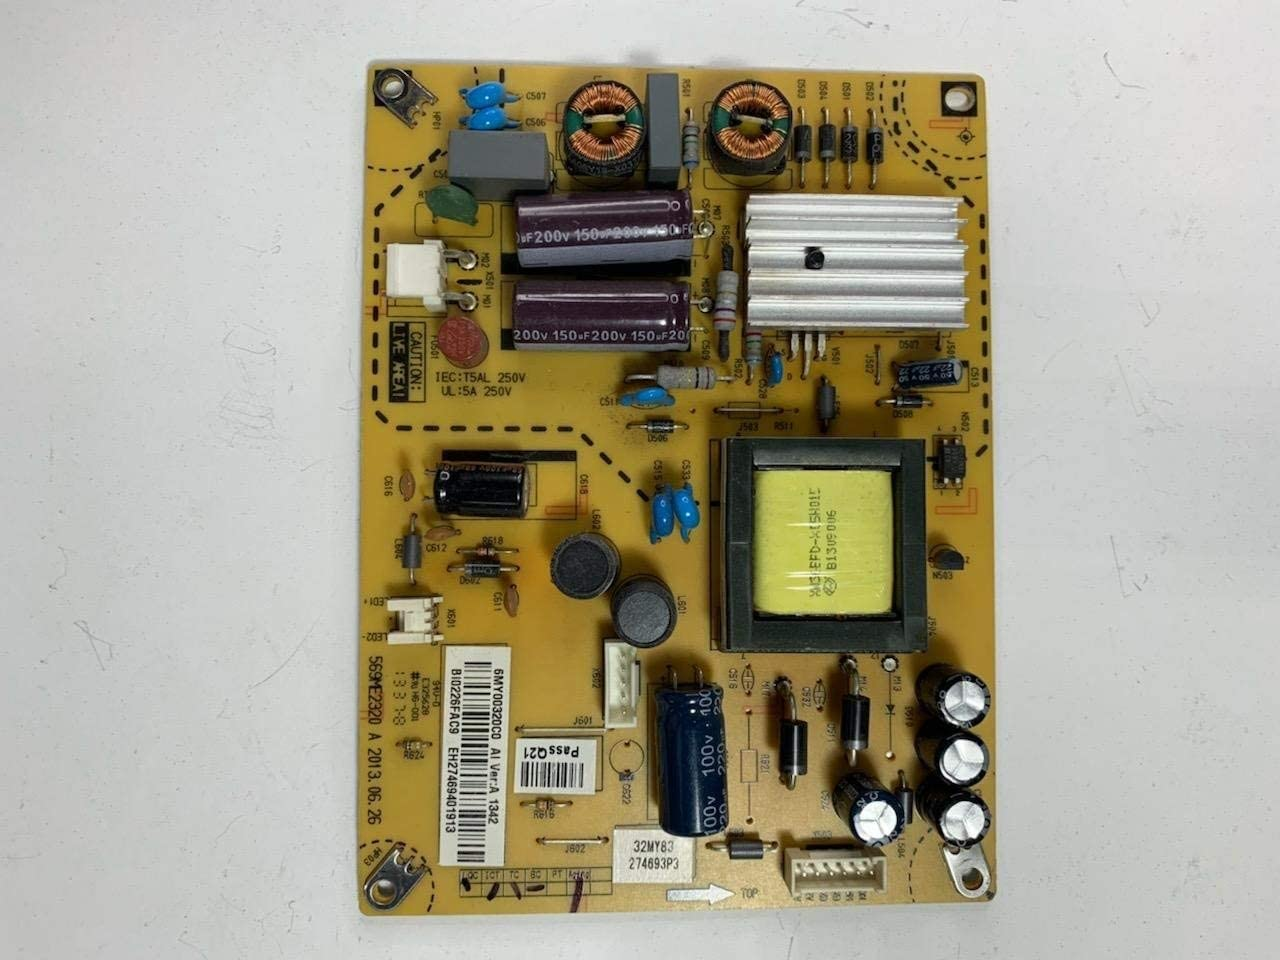 INSIGNIA 32 NS-32D201NA14 6MY00320C0 Power Supply Board Unit